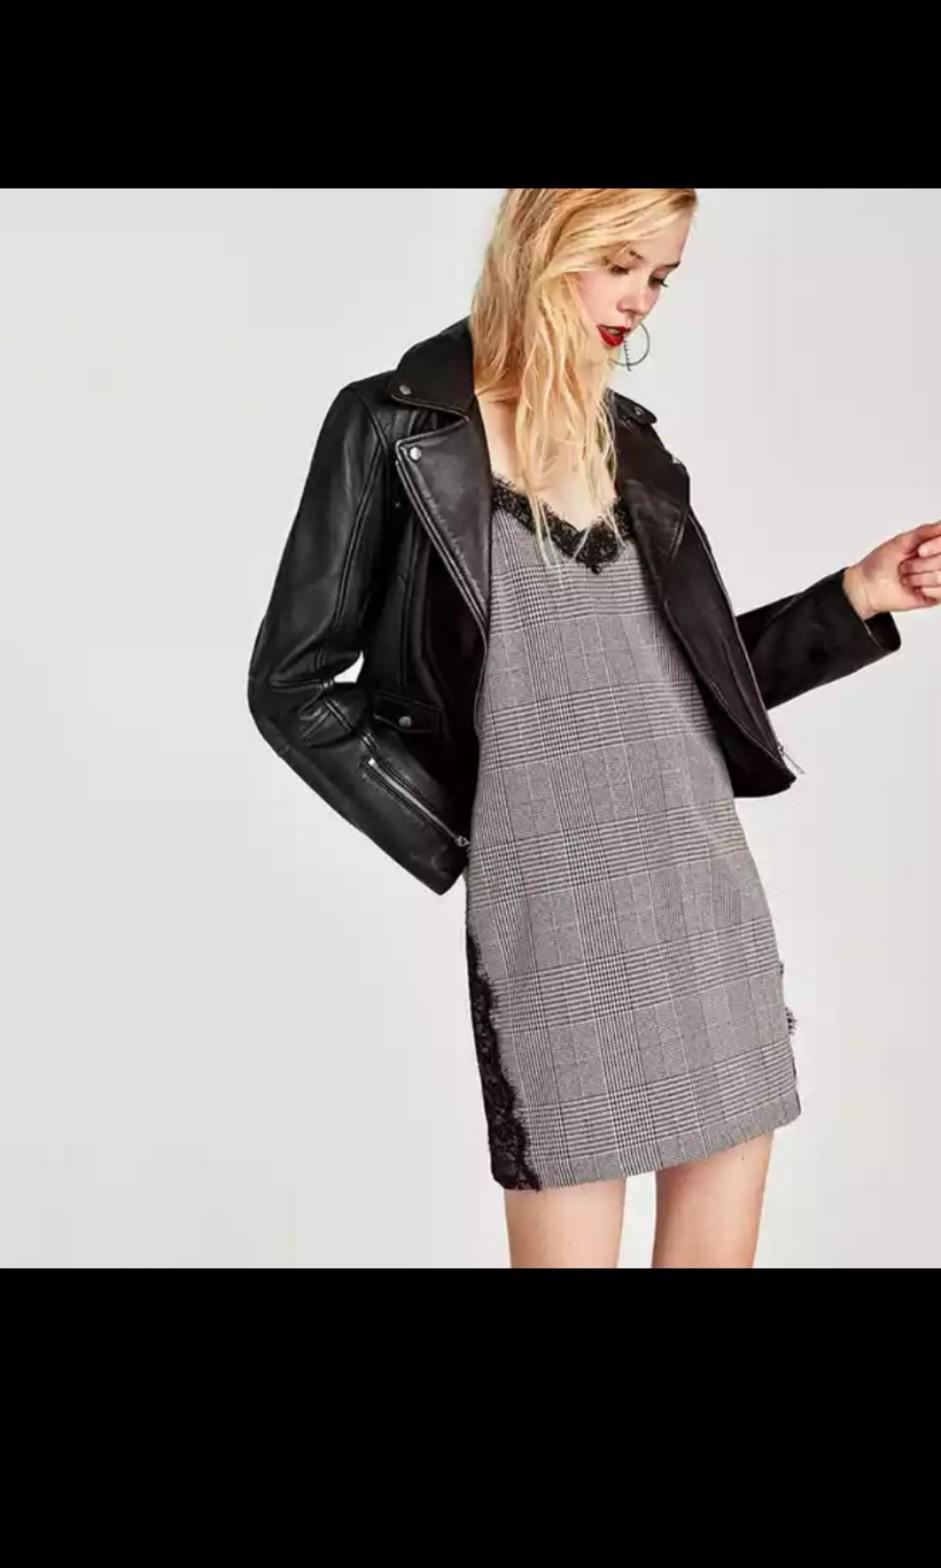 0c7c57ef Zara sexy dress, Women's Fashion, Clothes, Dresses & Skirts on Carousell